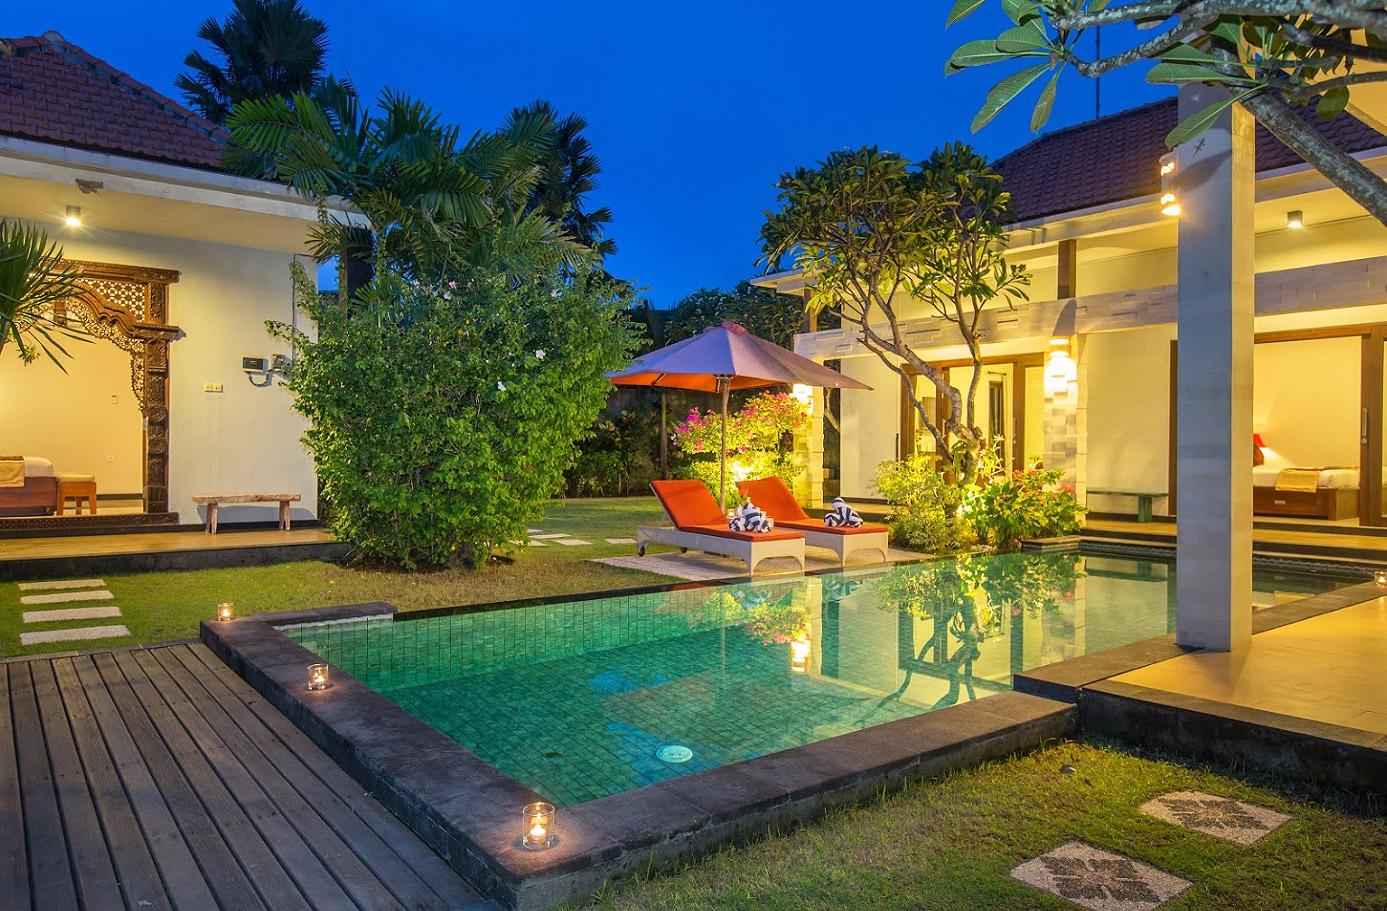 Bali villa amabel 3 bedrooms seminyak 1 bali villas for Seminyak villas 1 bedroom